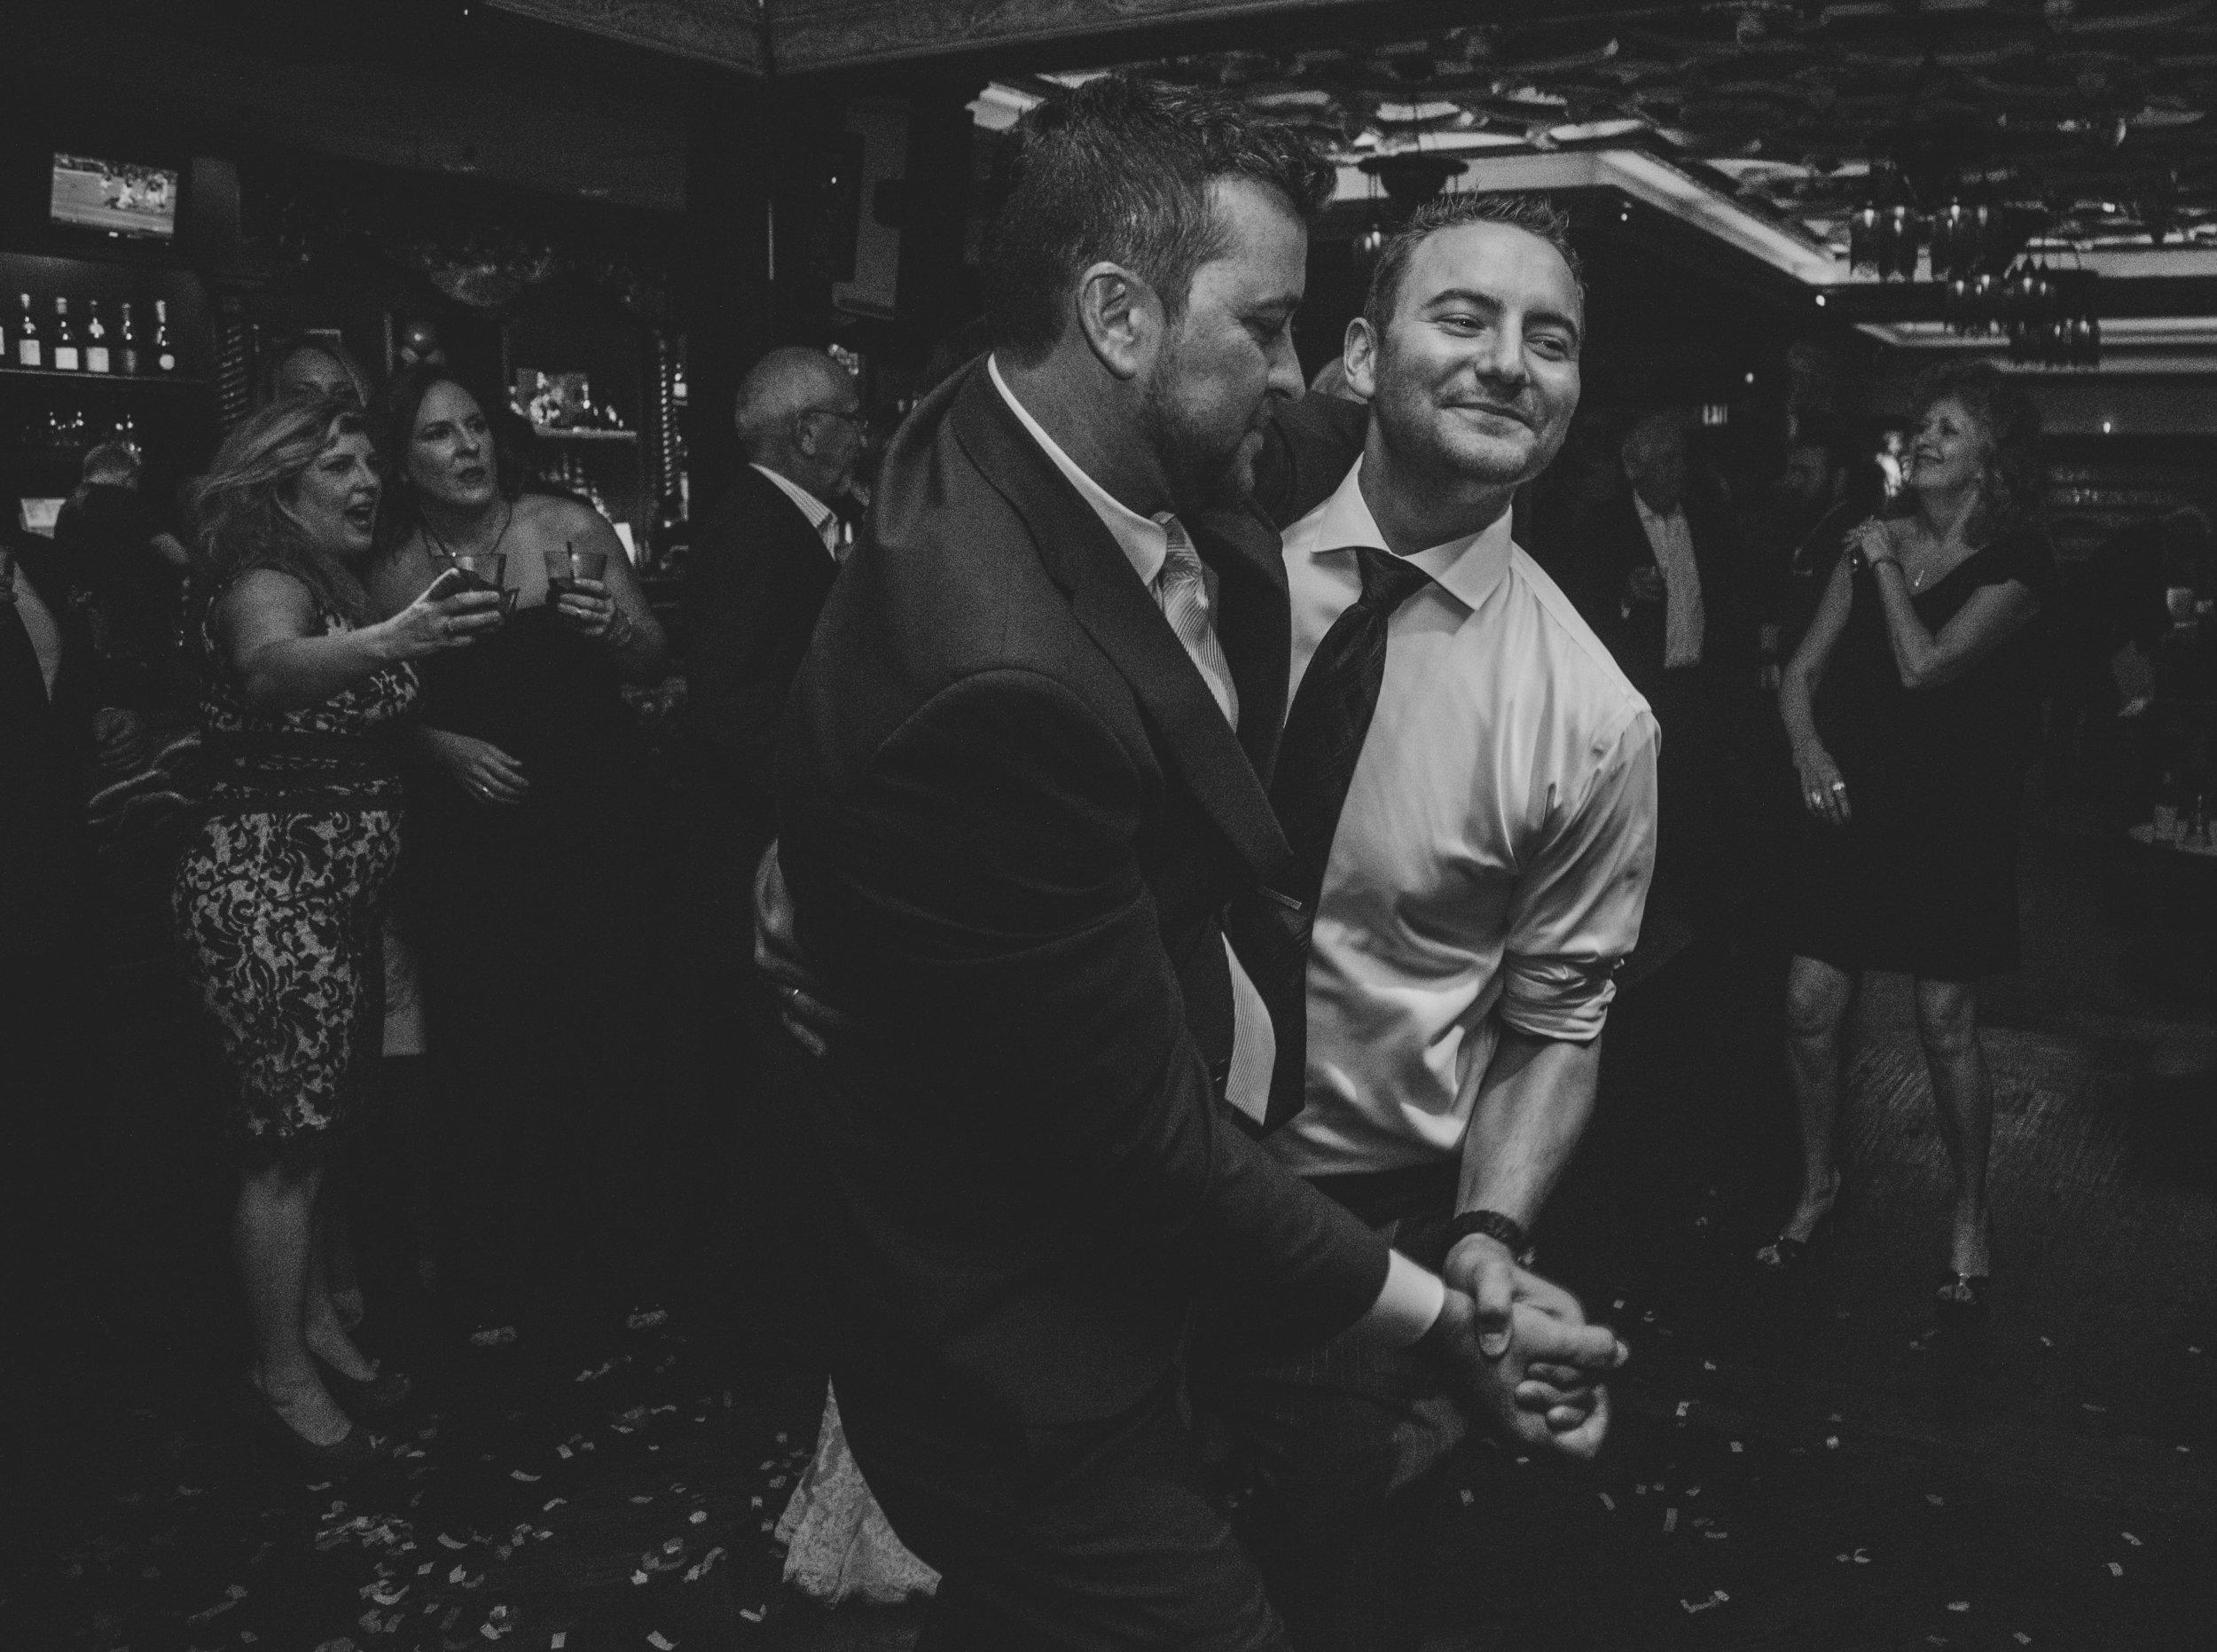 ATGI_Kat and Gabe Wedding 2016_2S8A6310.jpg